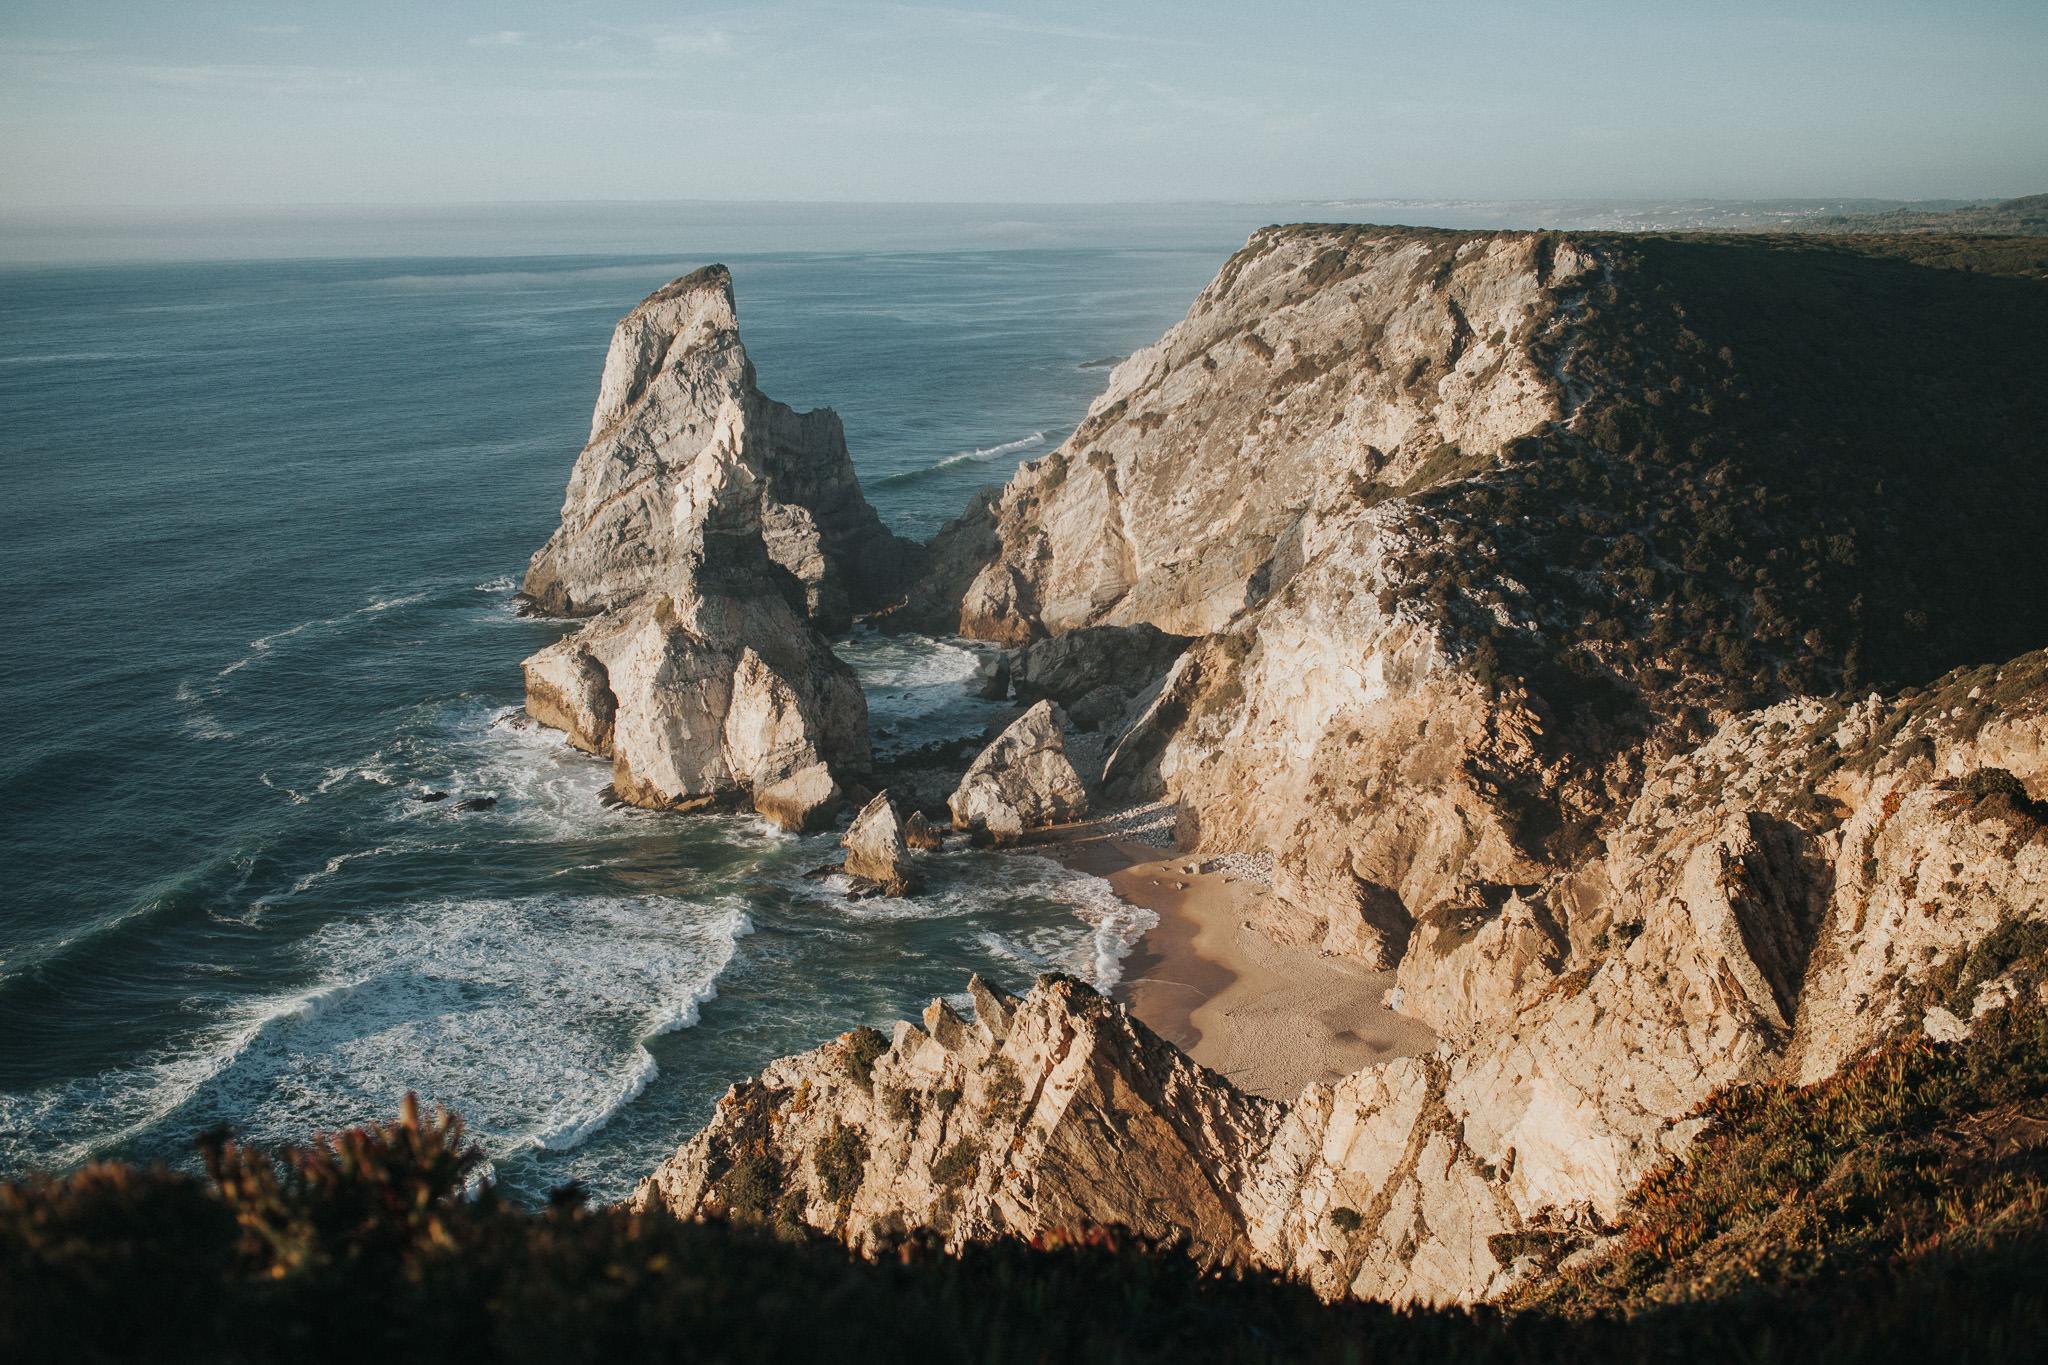 View over Praia da Ursa